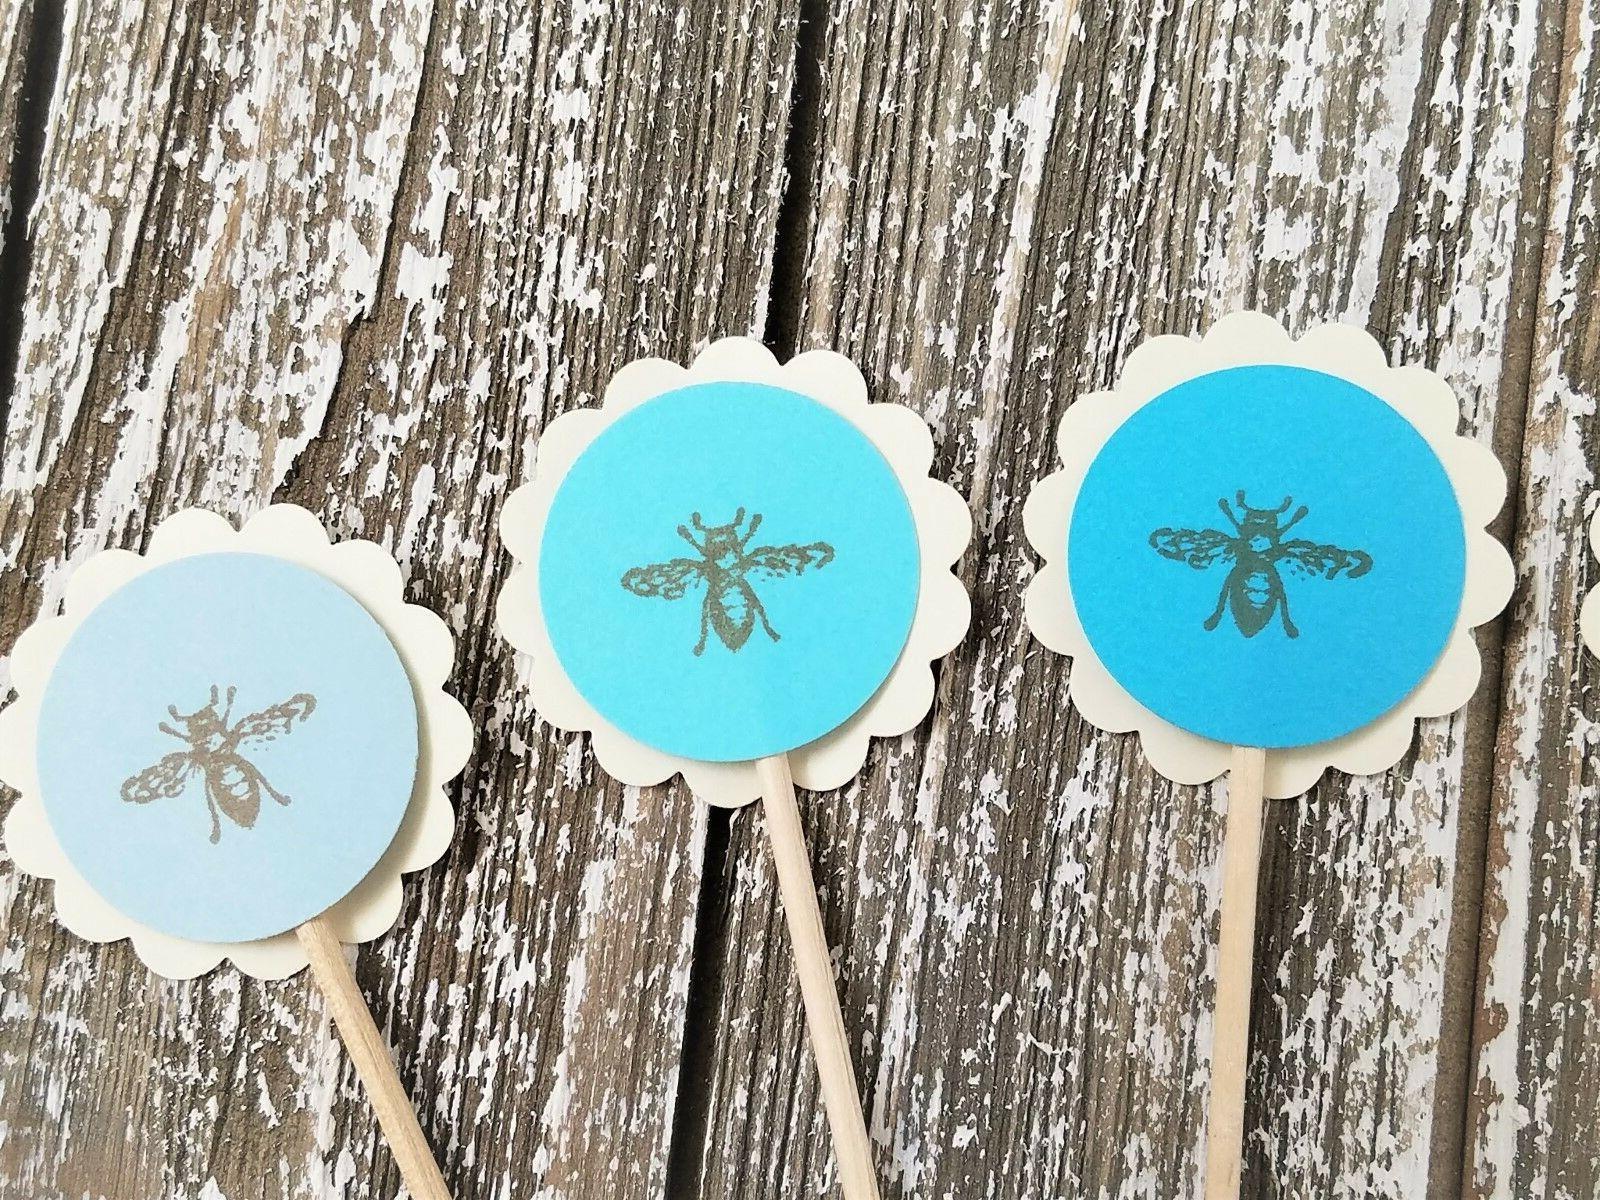 50 Bee Cupcake Toppers Wedding Baby Shower Its a Boy Birthda